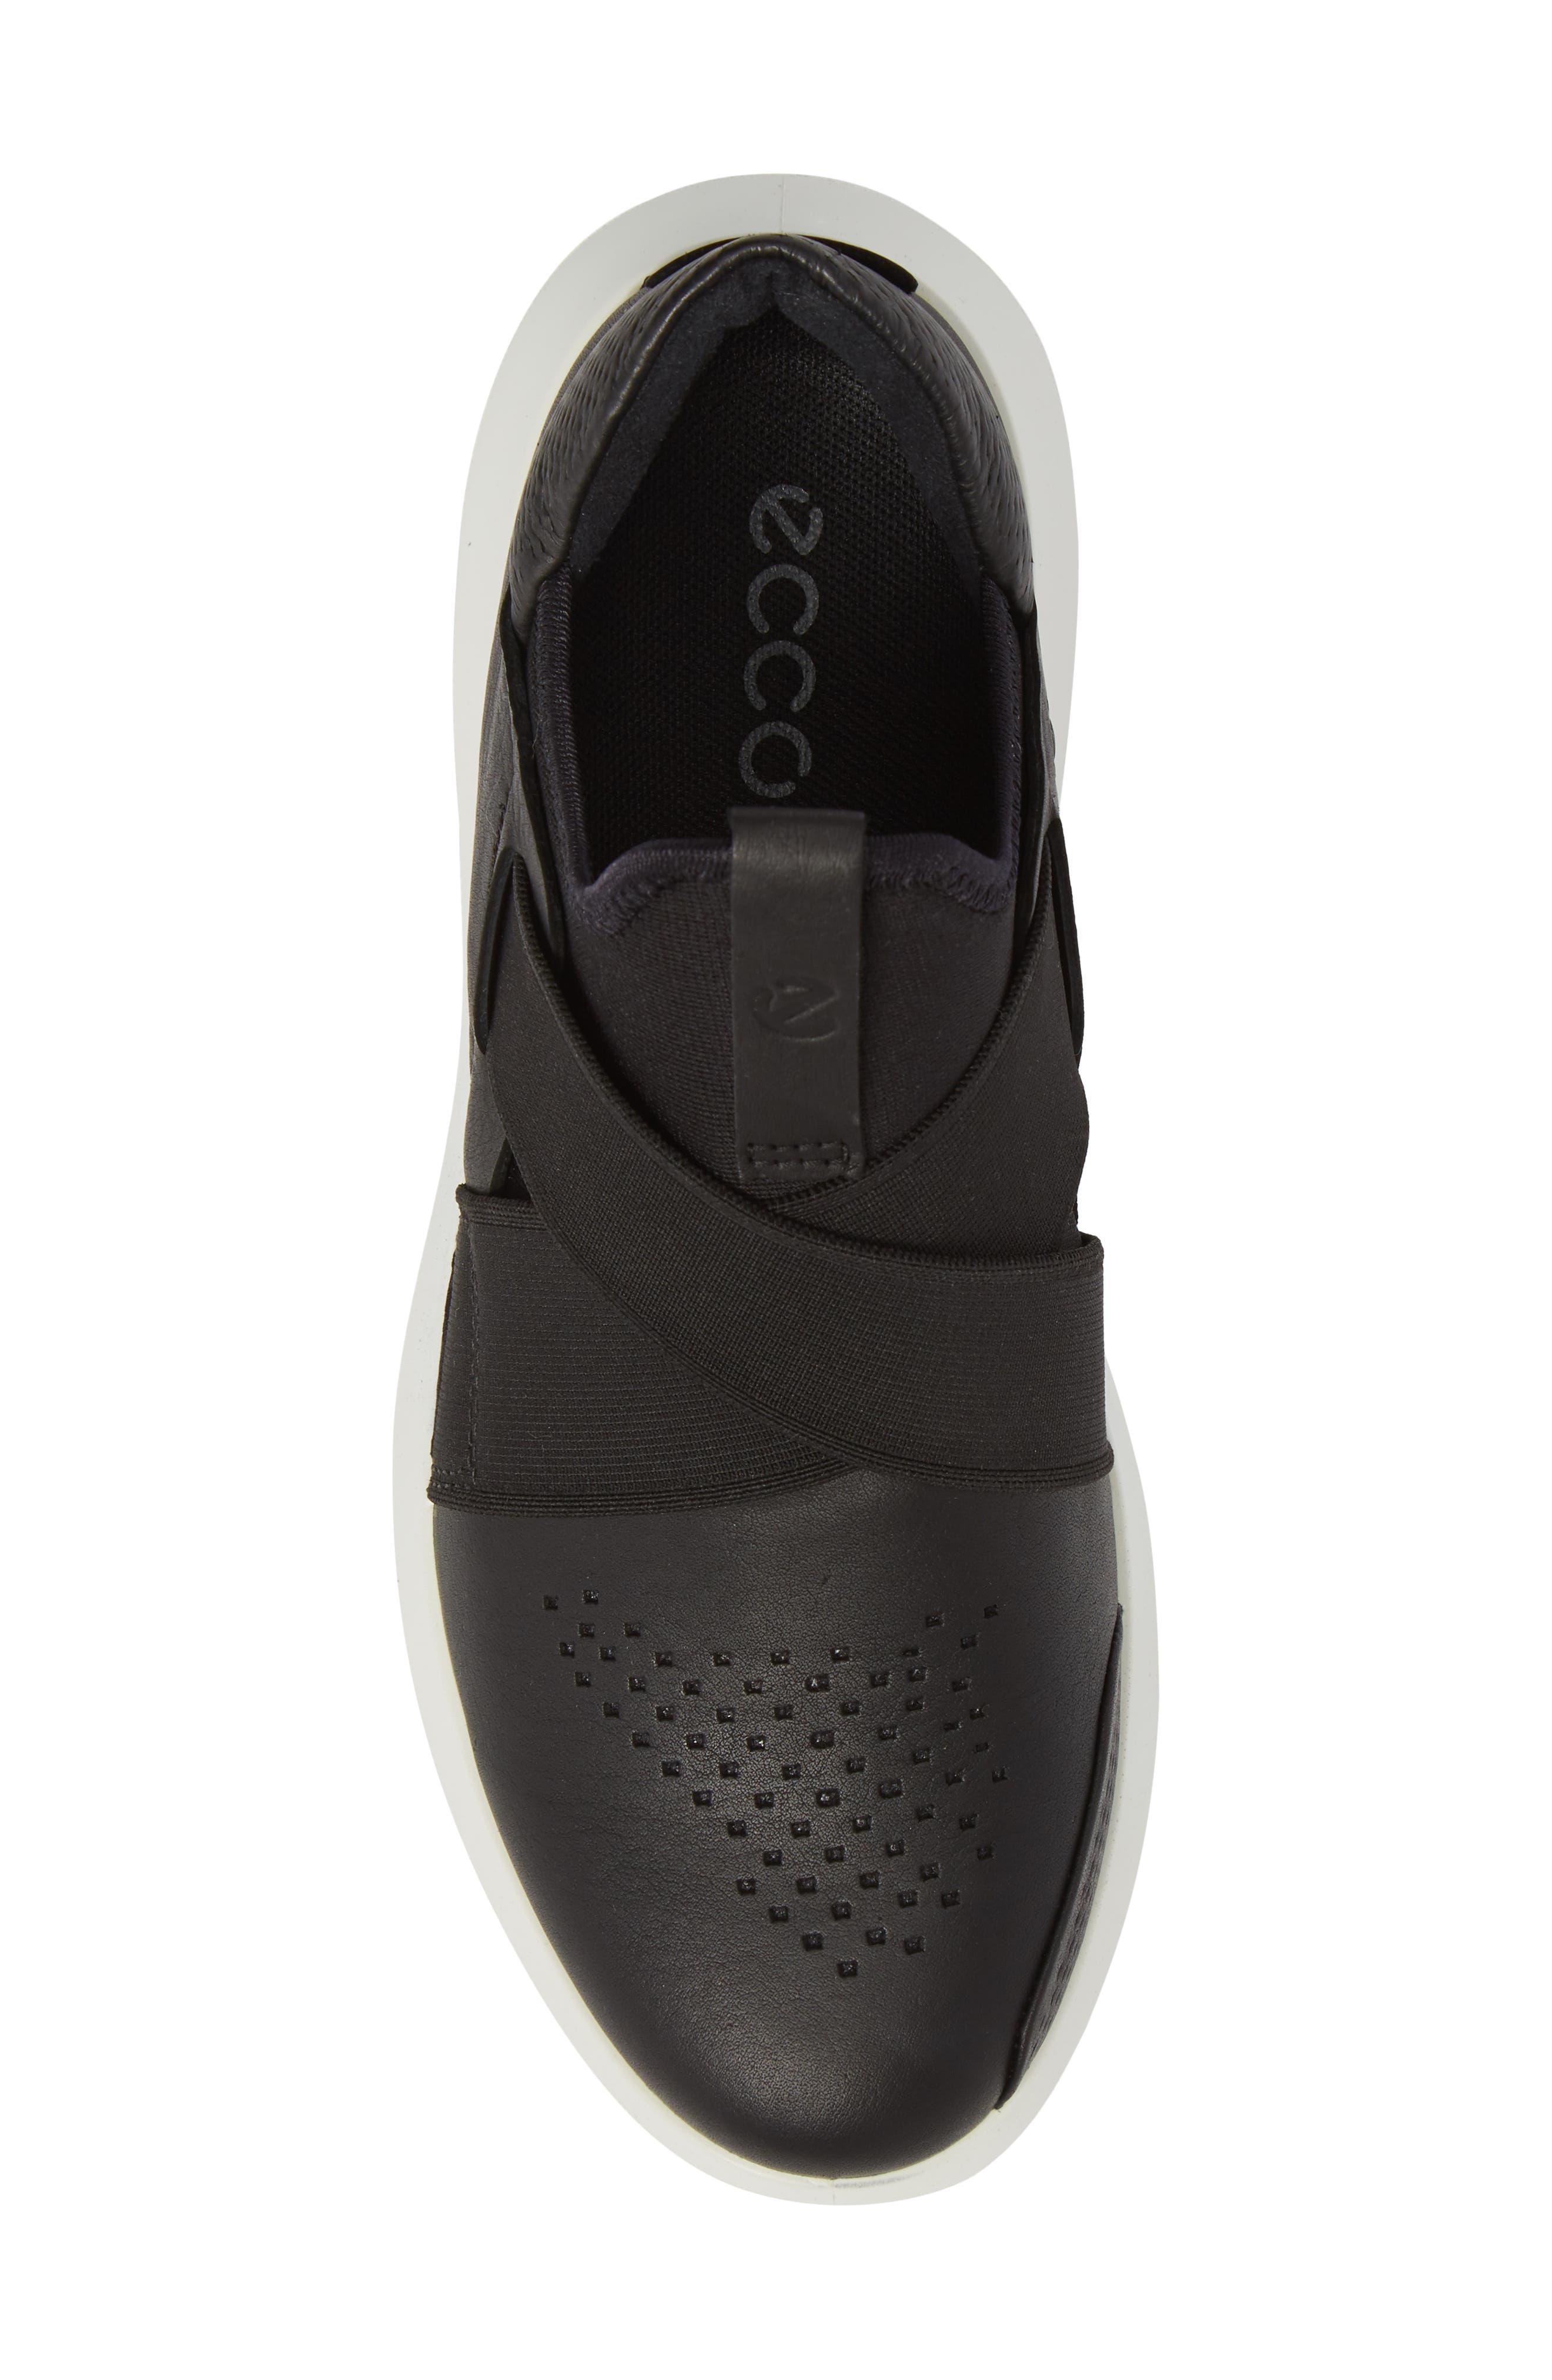 Scinapse Band Sneaker,                             Alternate thumbnail 5, color,                             Black